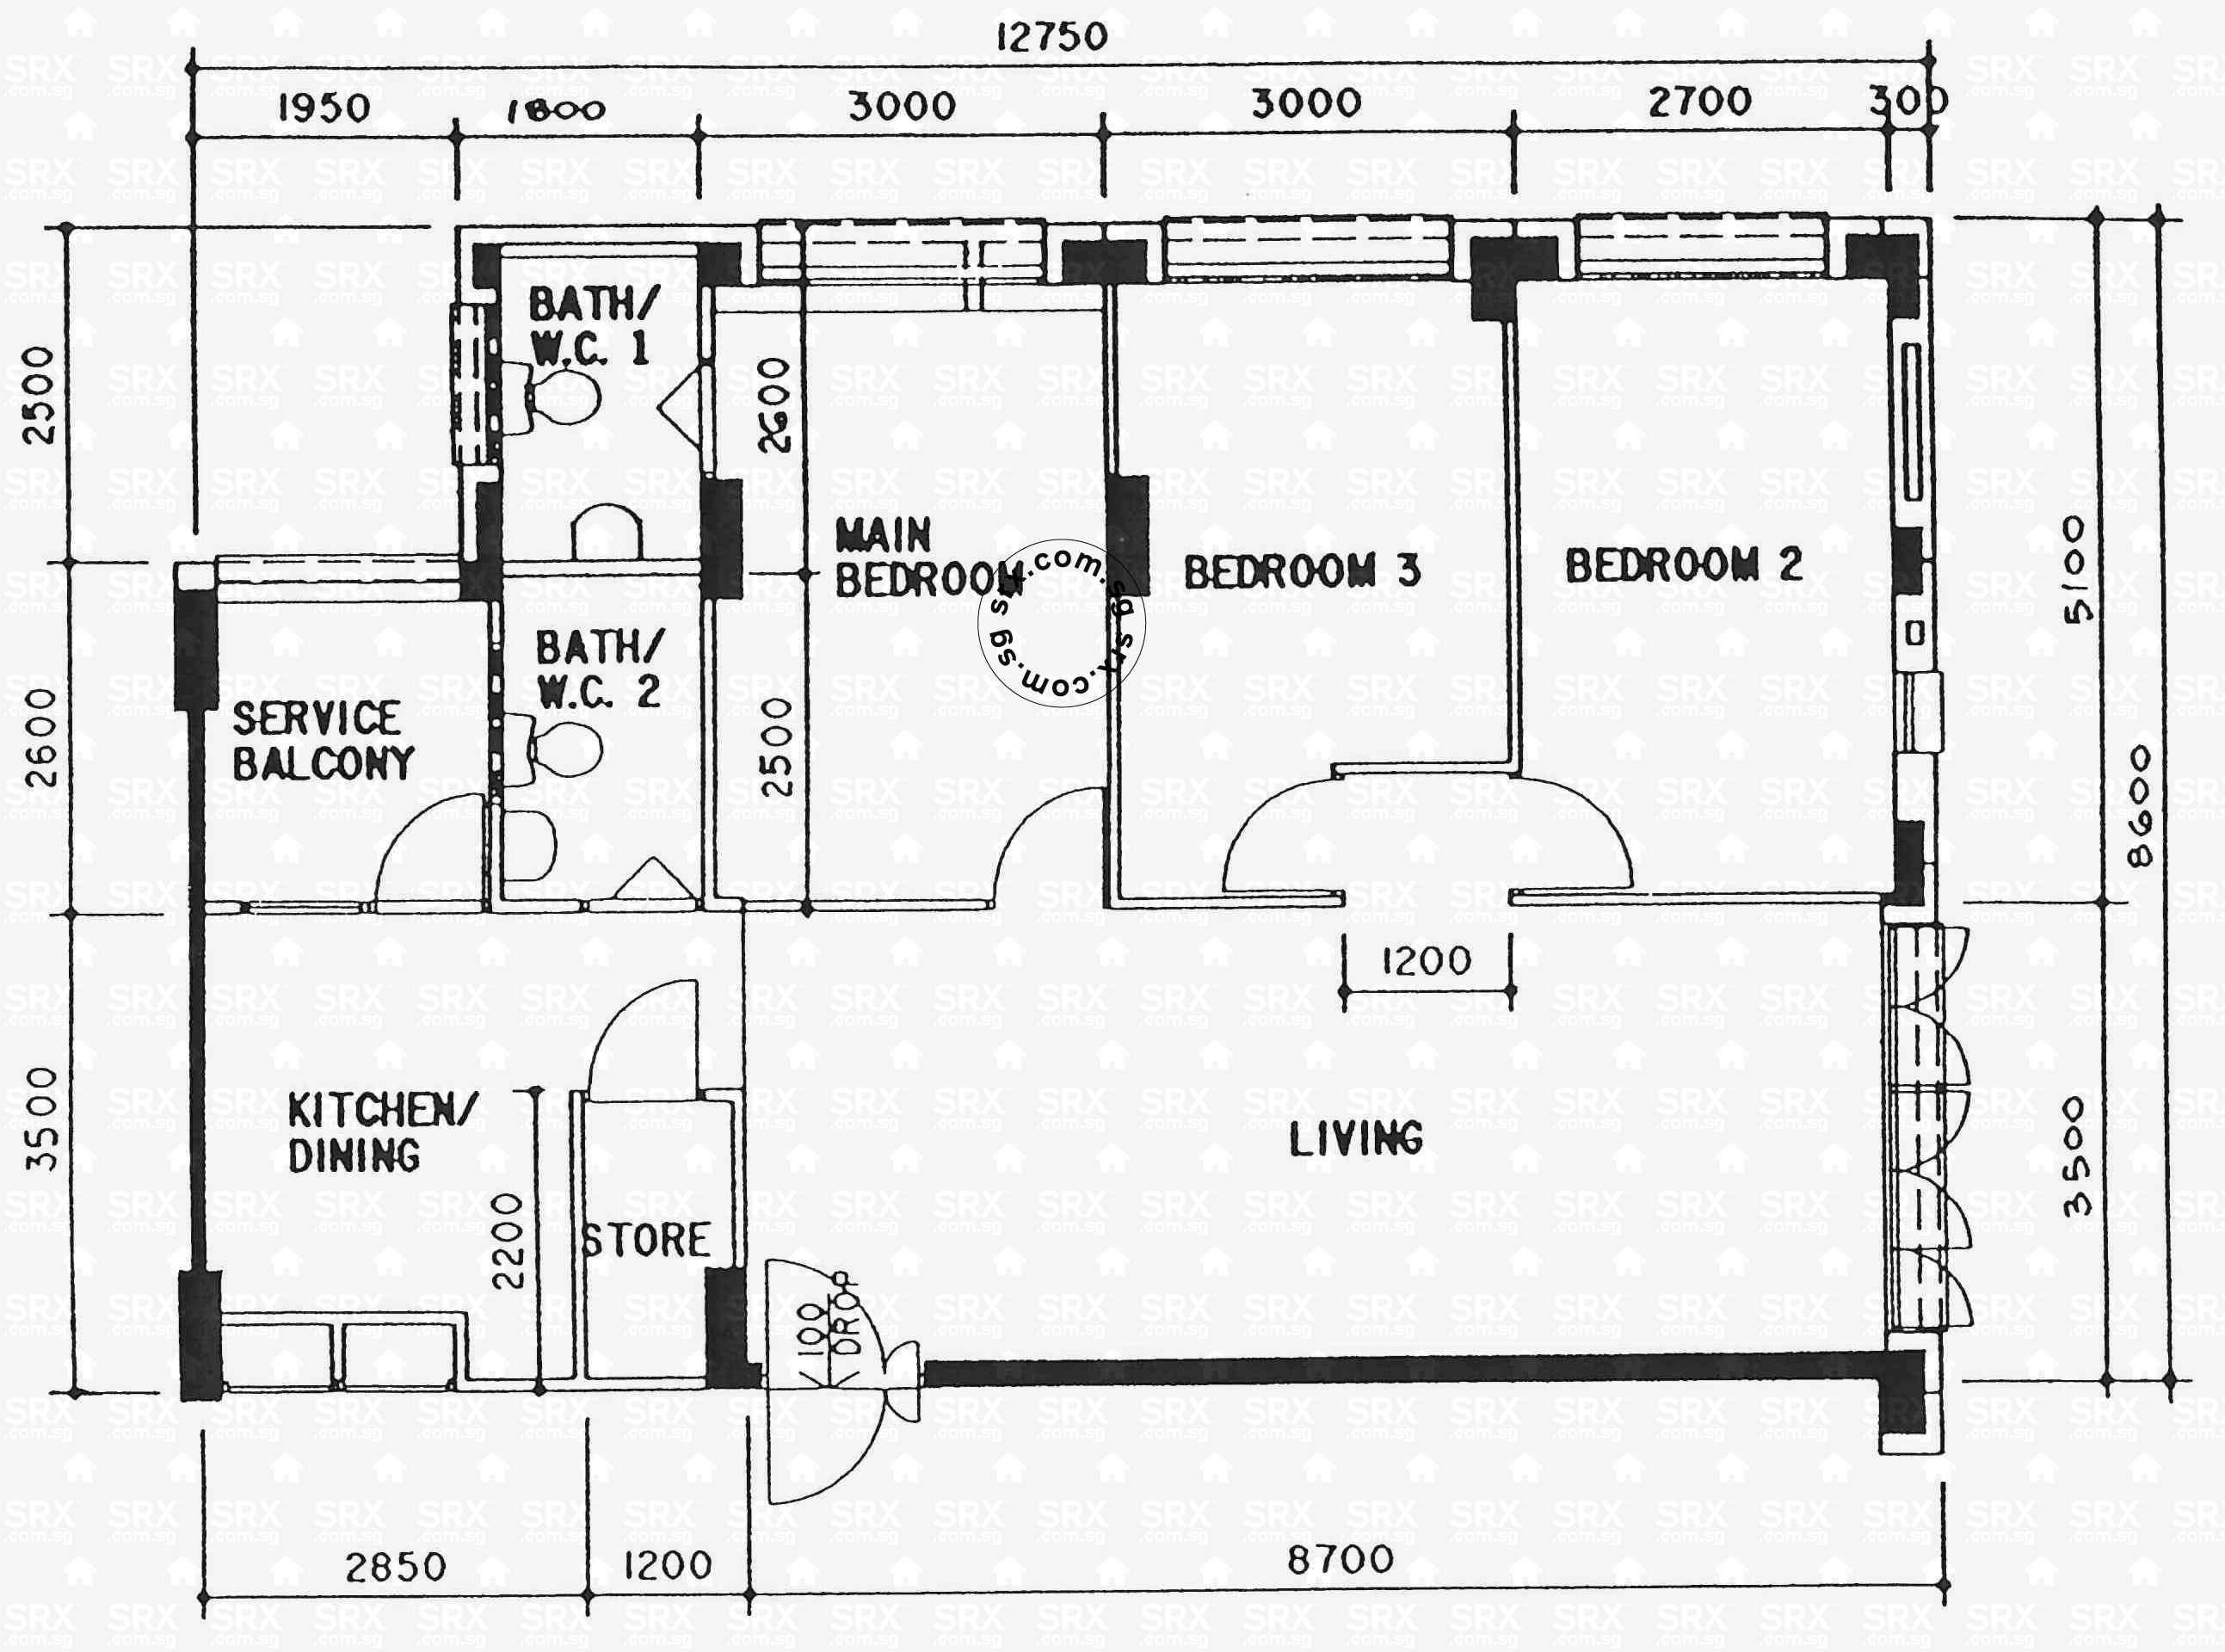 avenue  woodlands avenue  hdb details srx property floor plan  - floor plans for woodlands avenue hdb details srx property